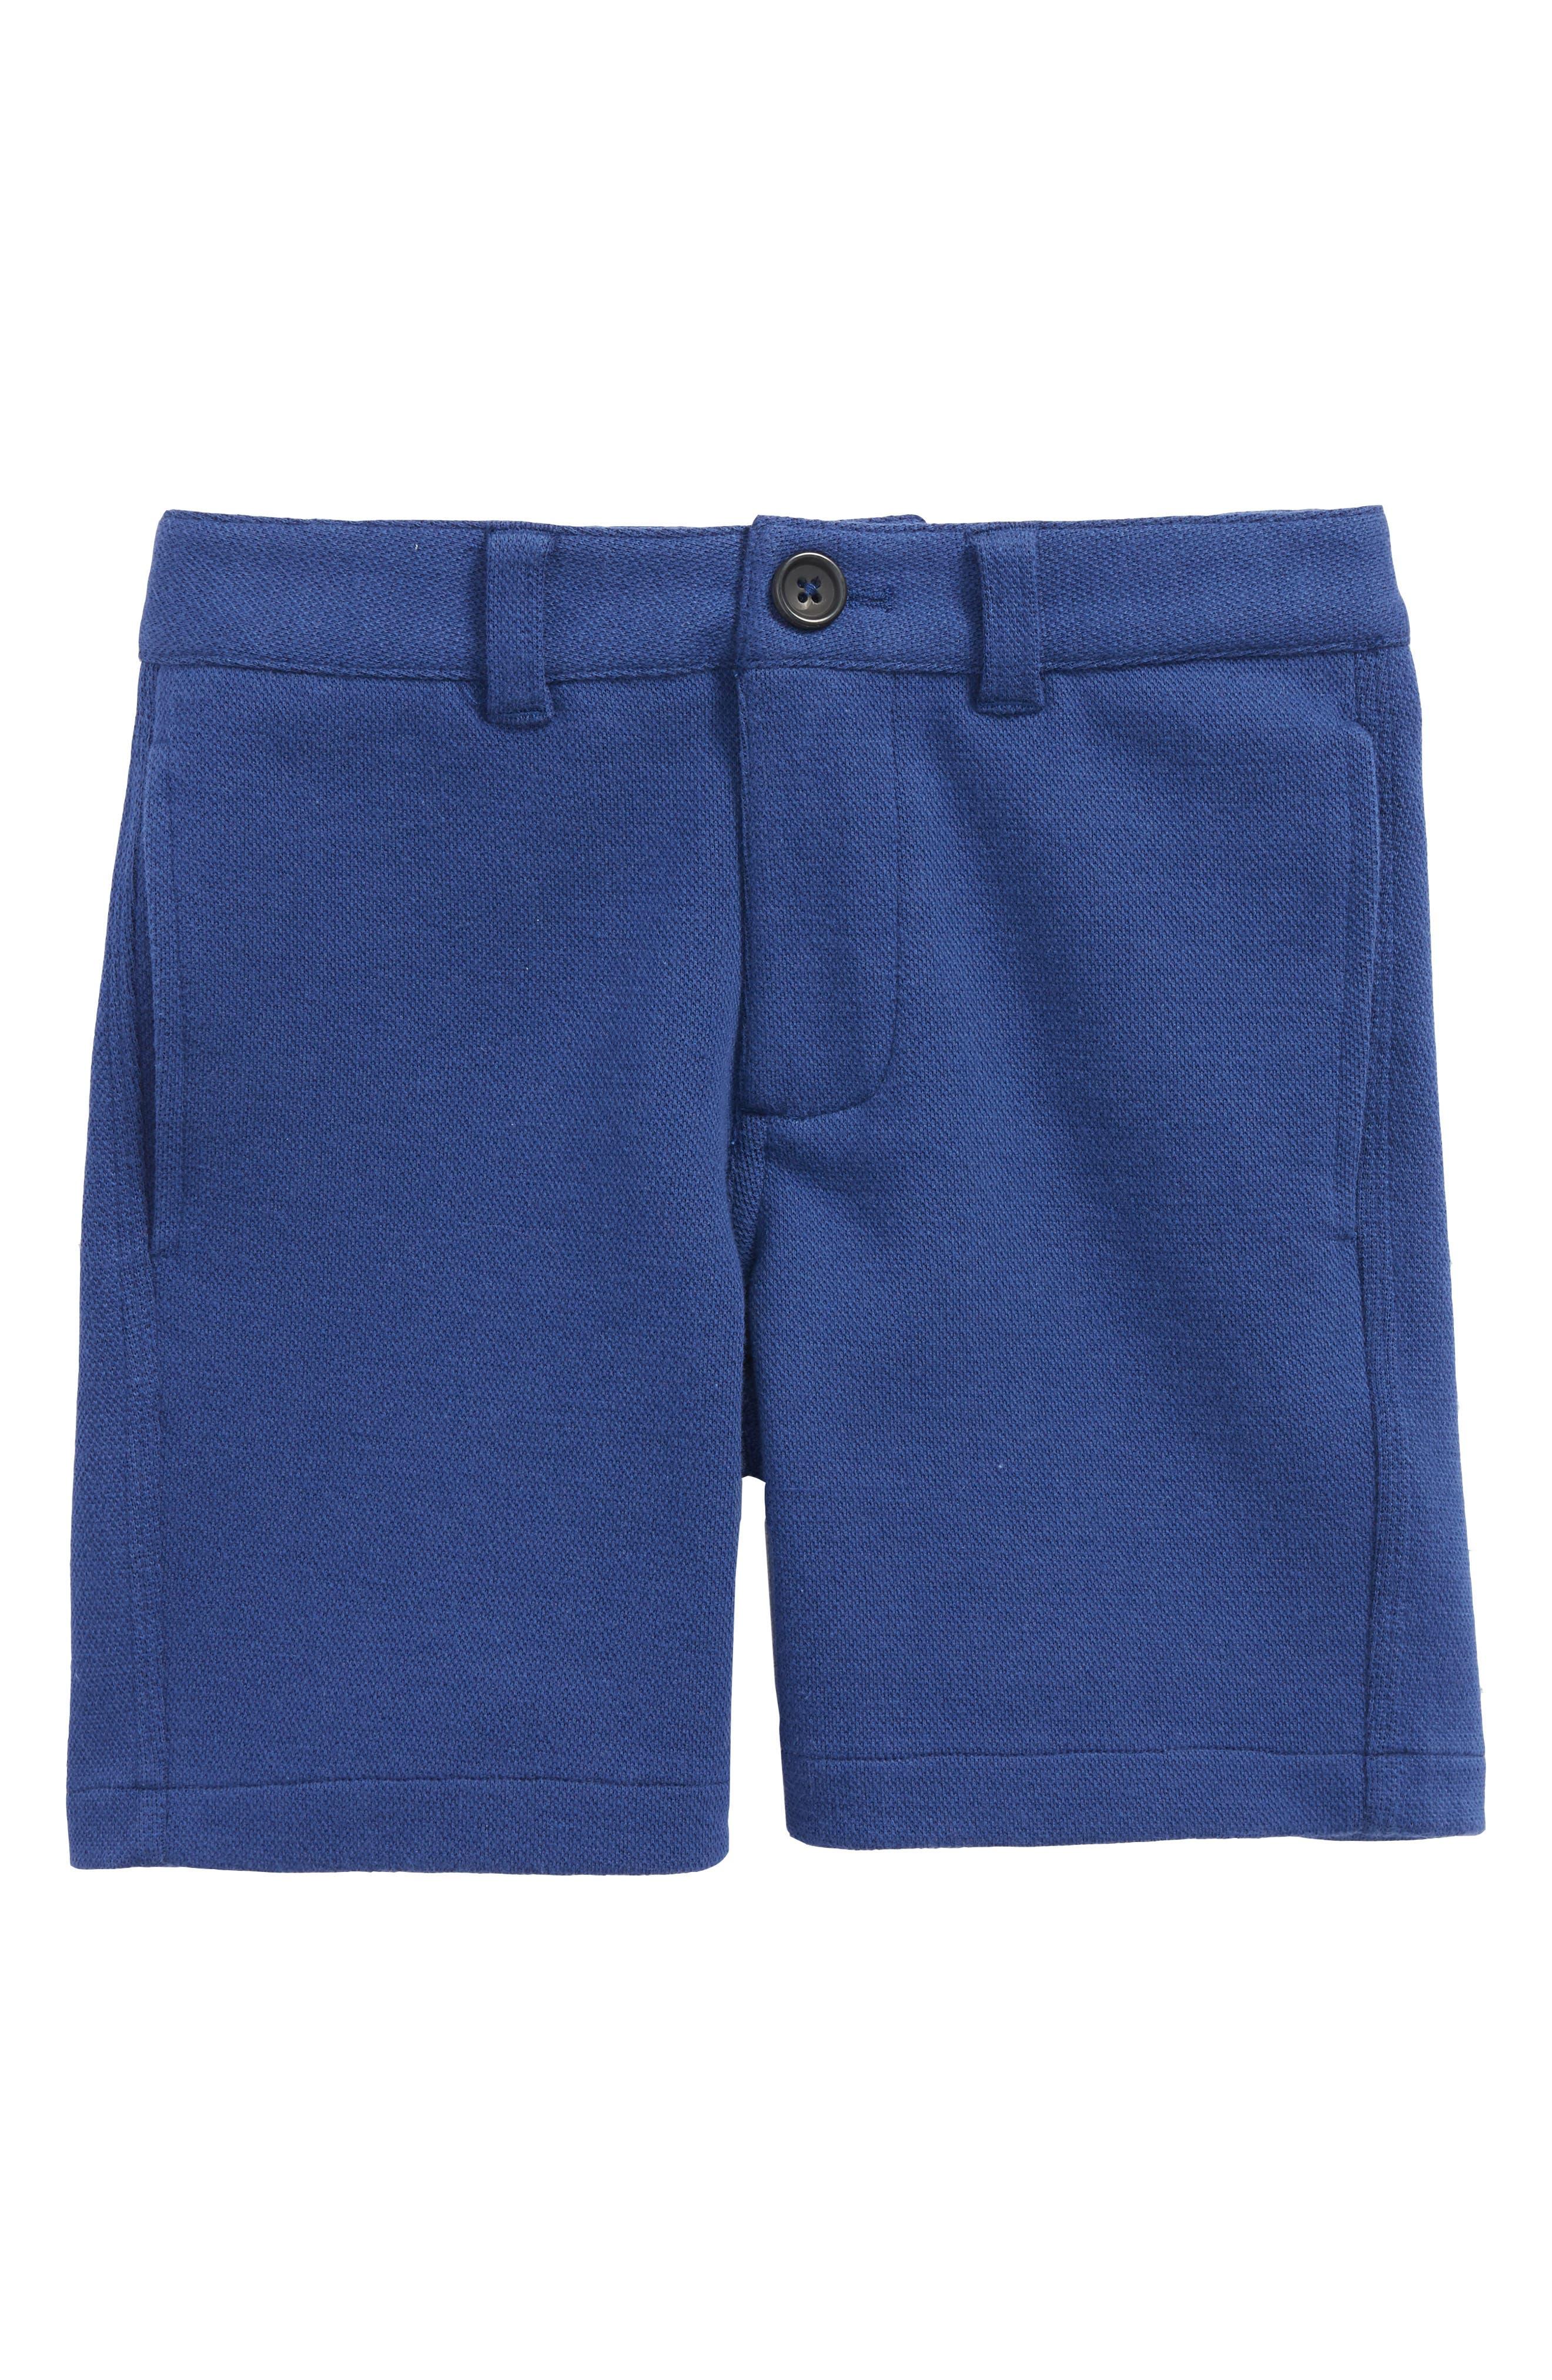 Jersey Chino Shorts,                         Main,                         color, Beacon Blue